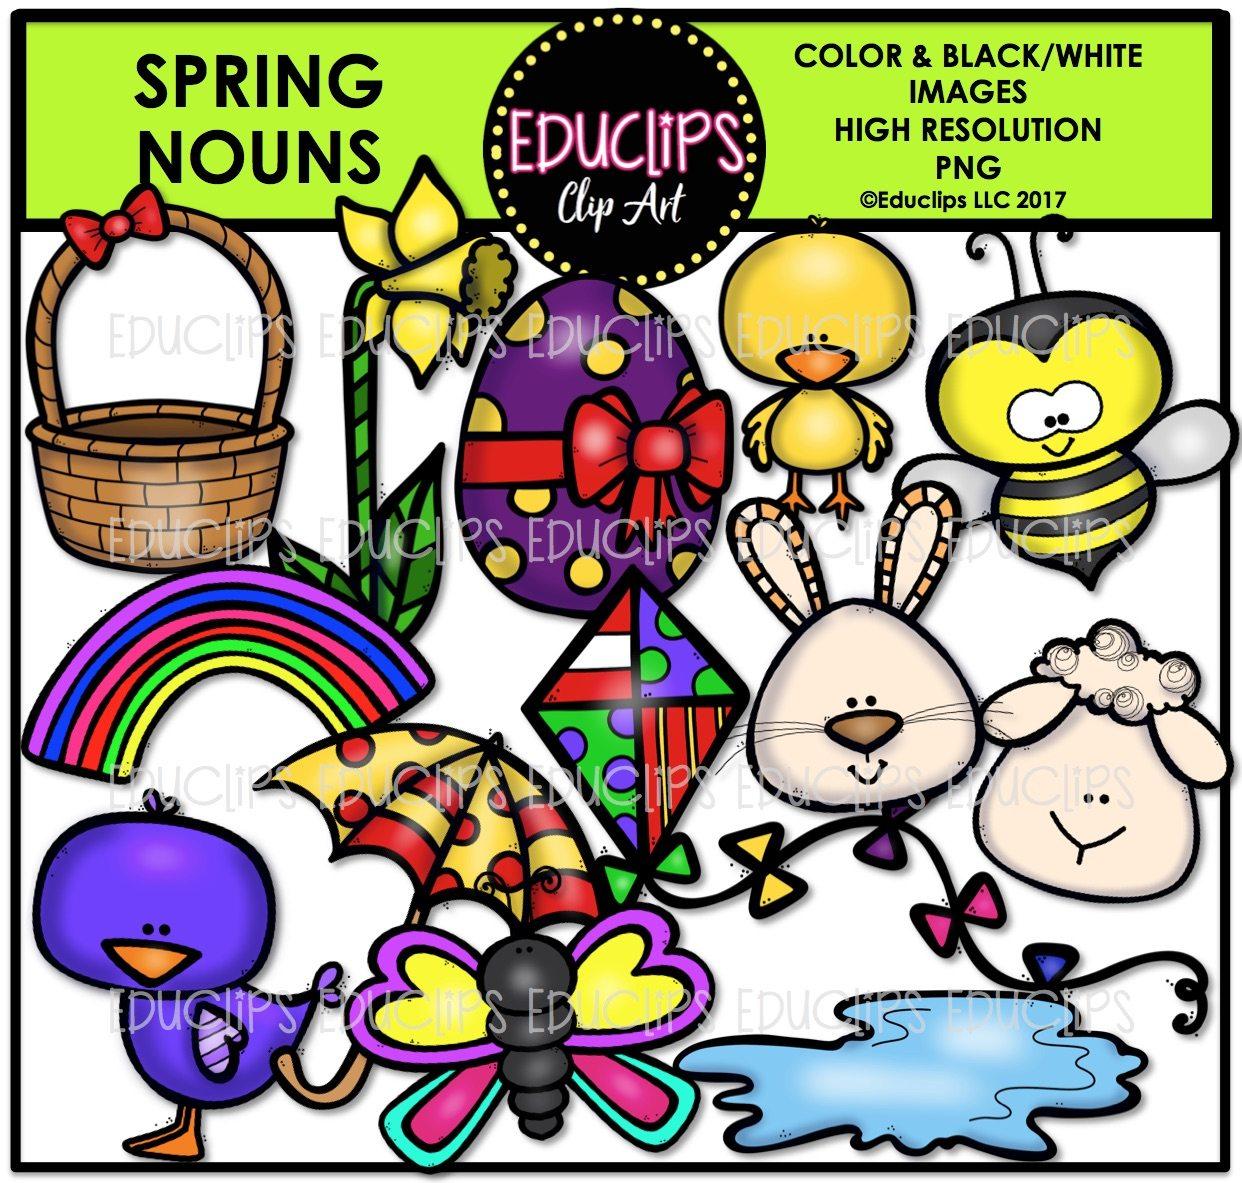 1242x1183 Spring Nouns Clip Art Bundle (Color And Bampw)